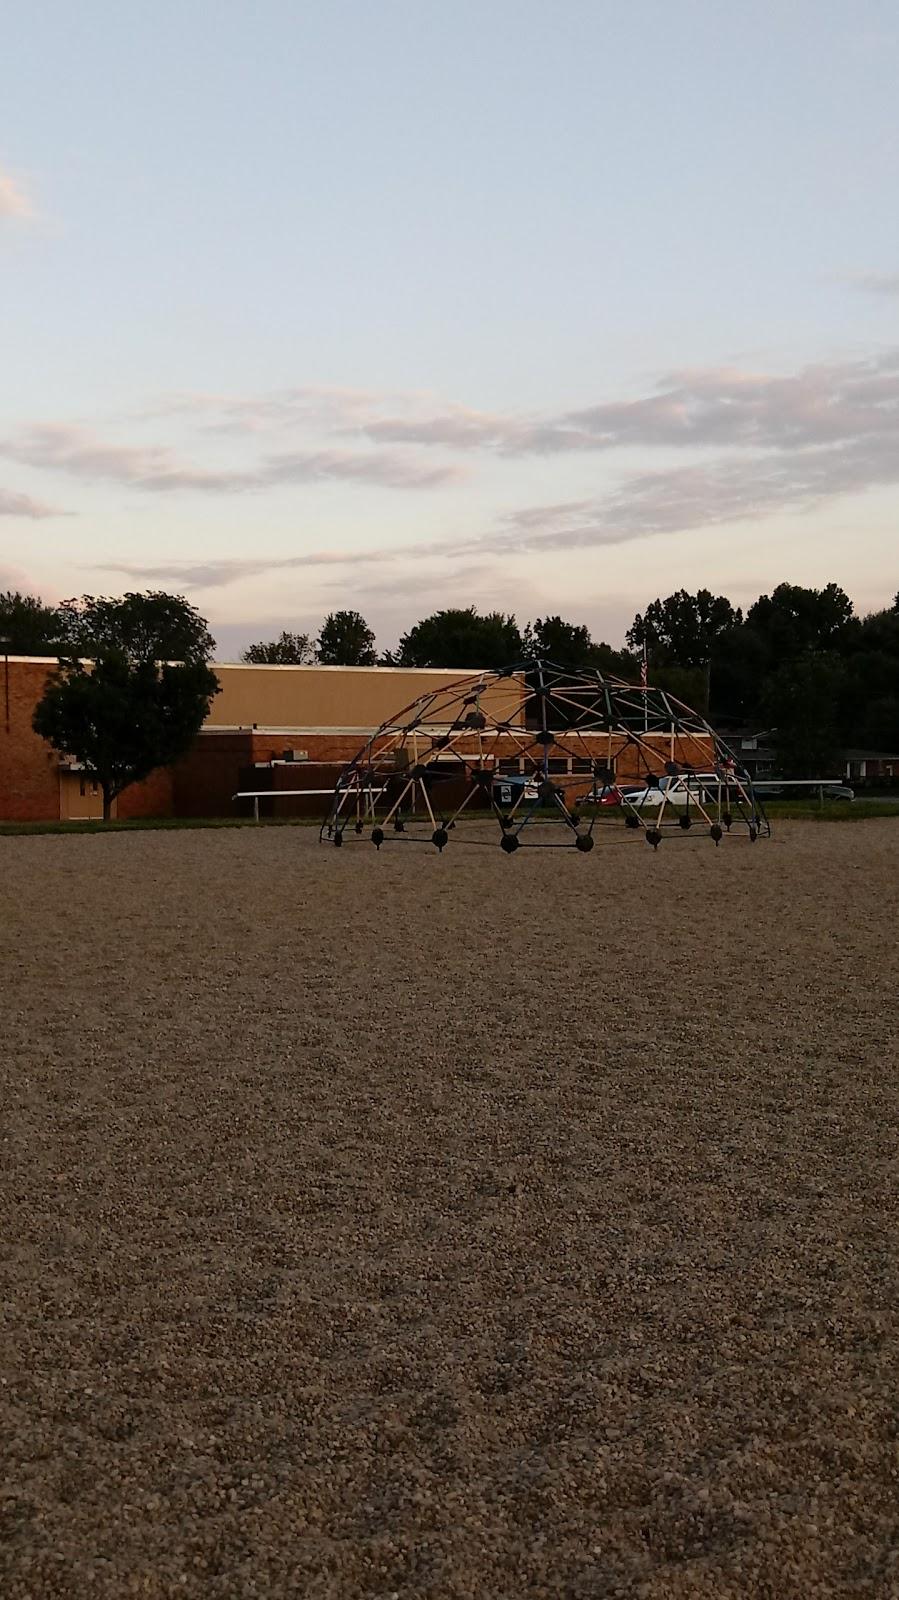 Summerside Elementary School - school    Photo 4 of 10   Address: 4639 Vermona Dr, Cincinnati, OH 45245, USA   Phone: (513) 947-7900